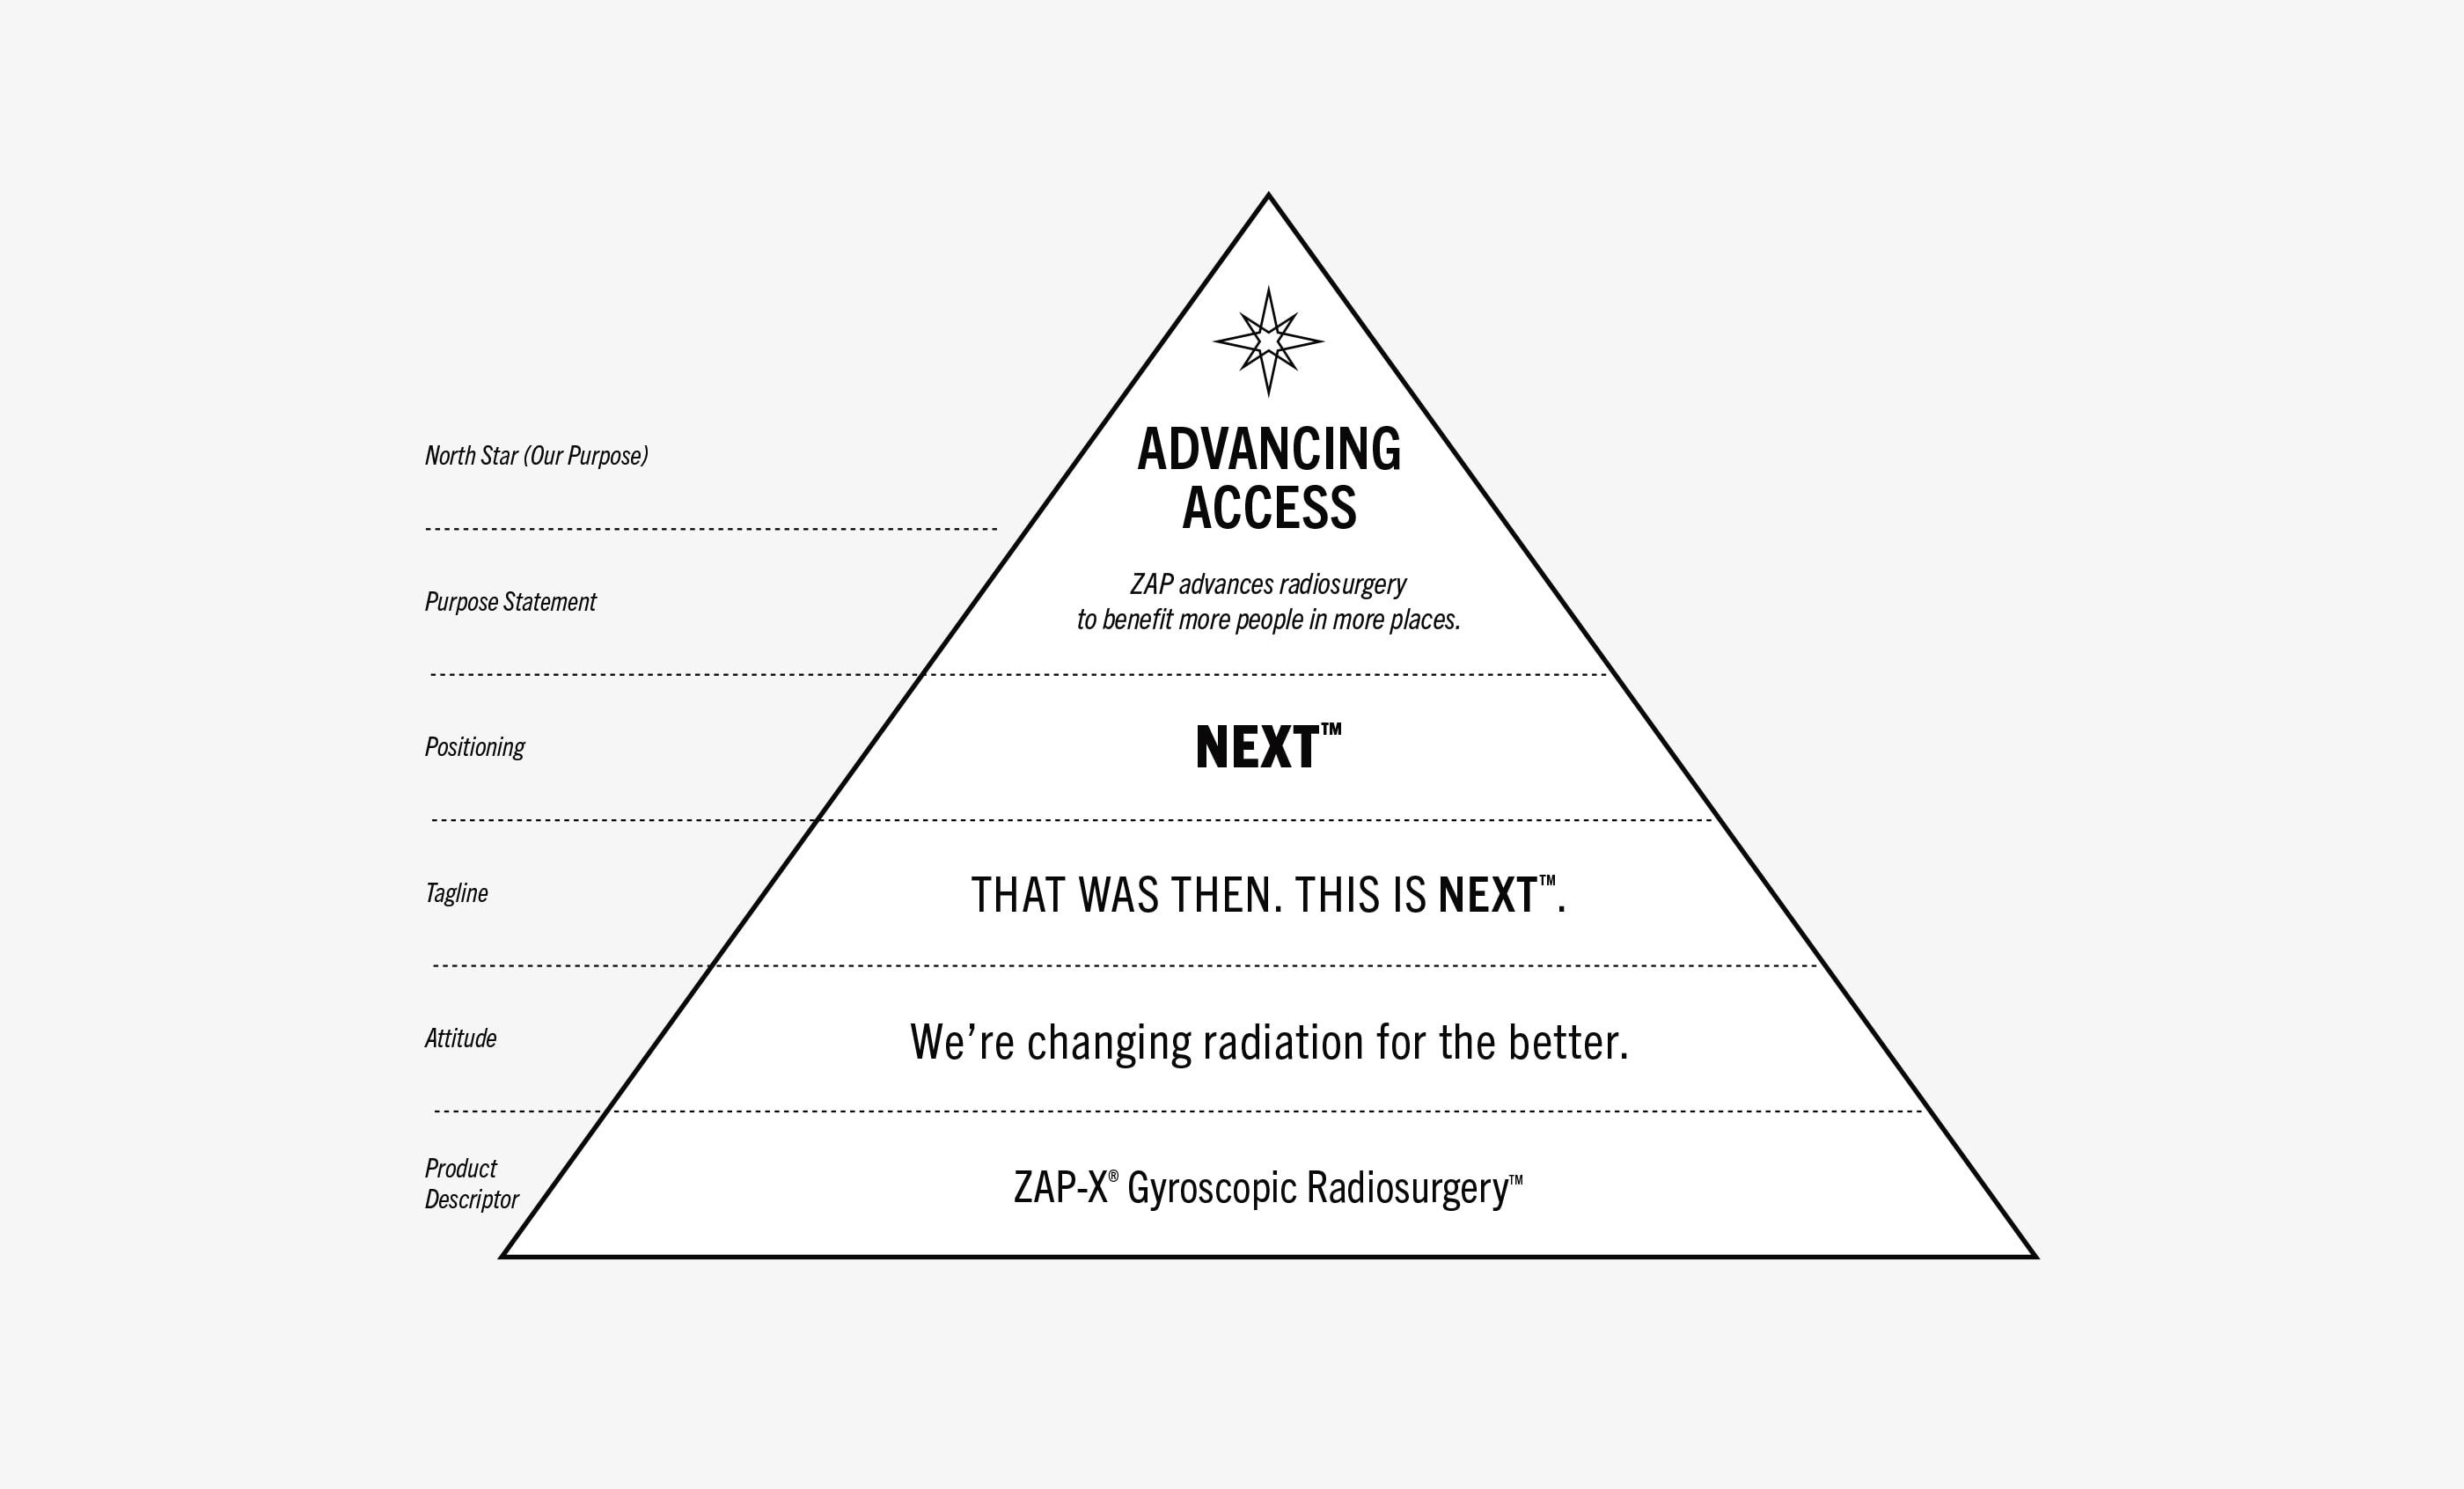 ZAP Advancing Access